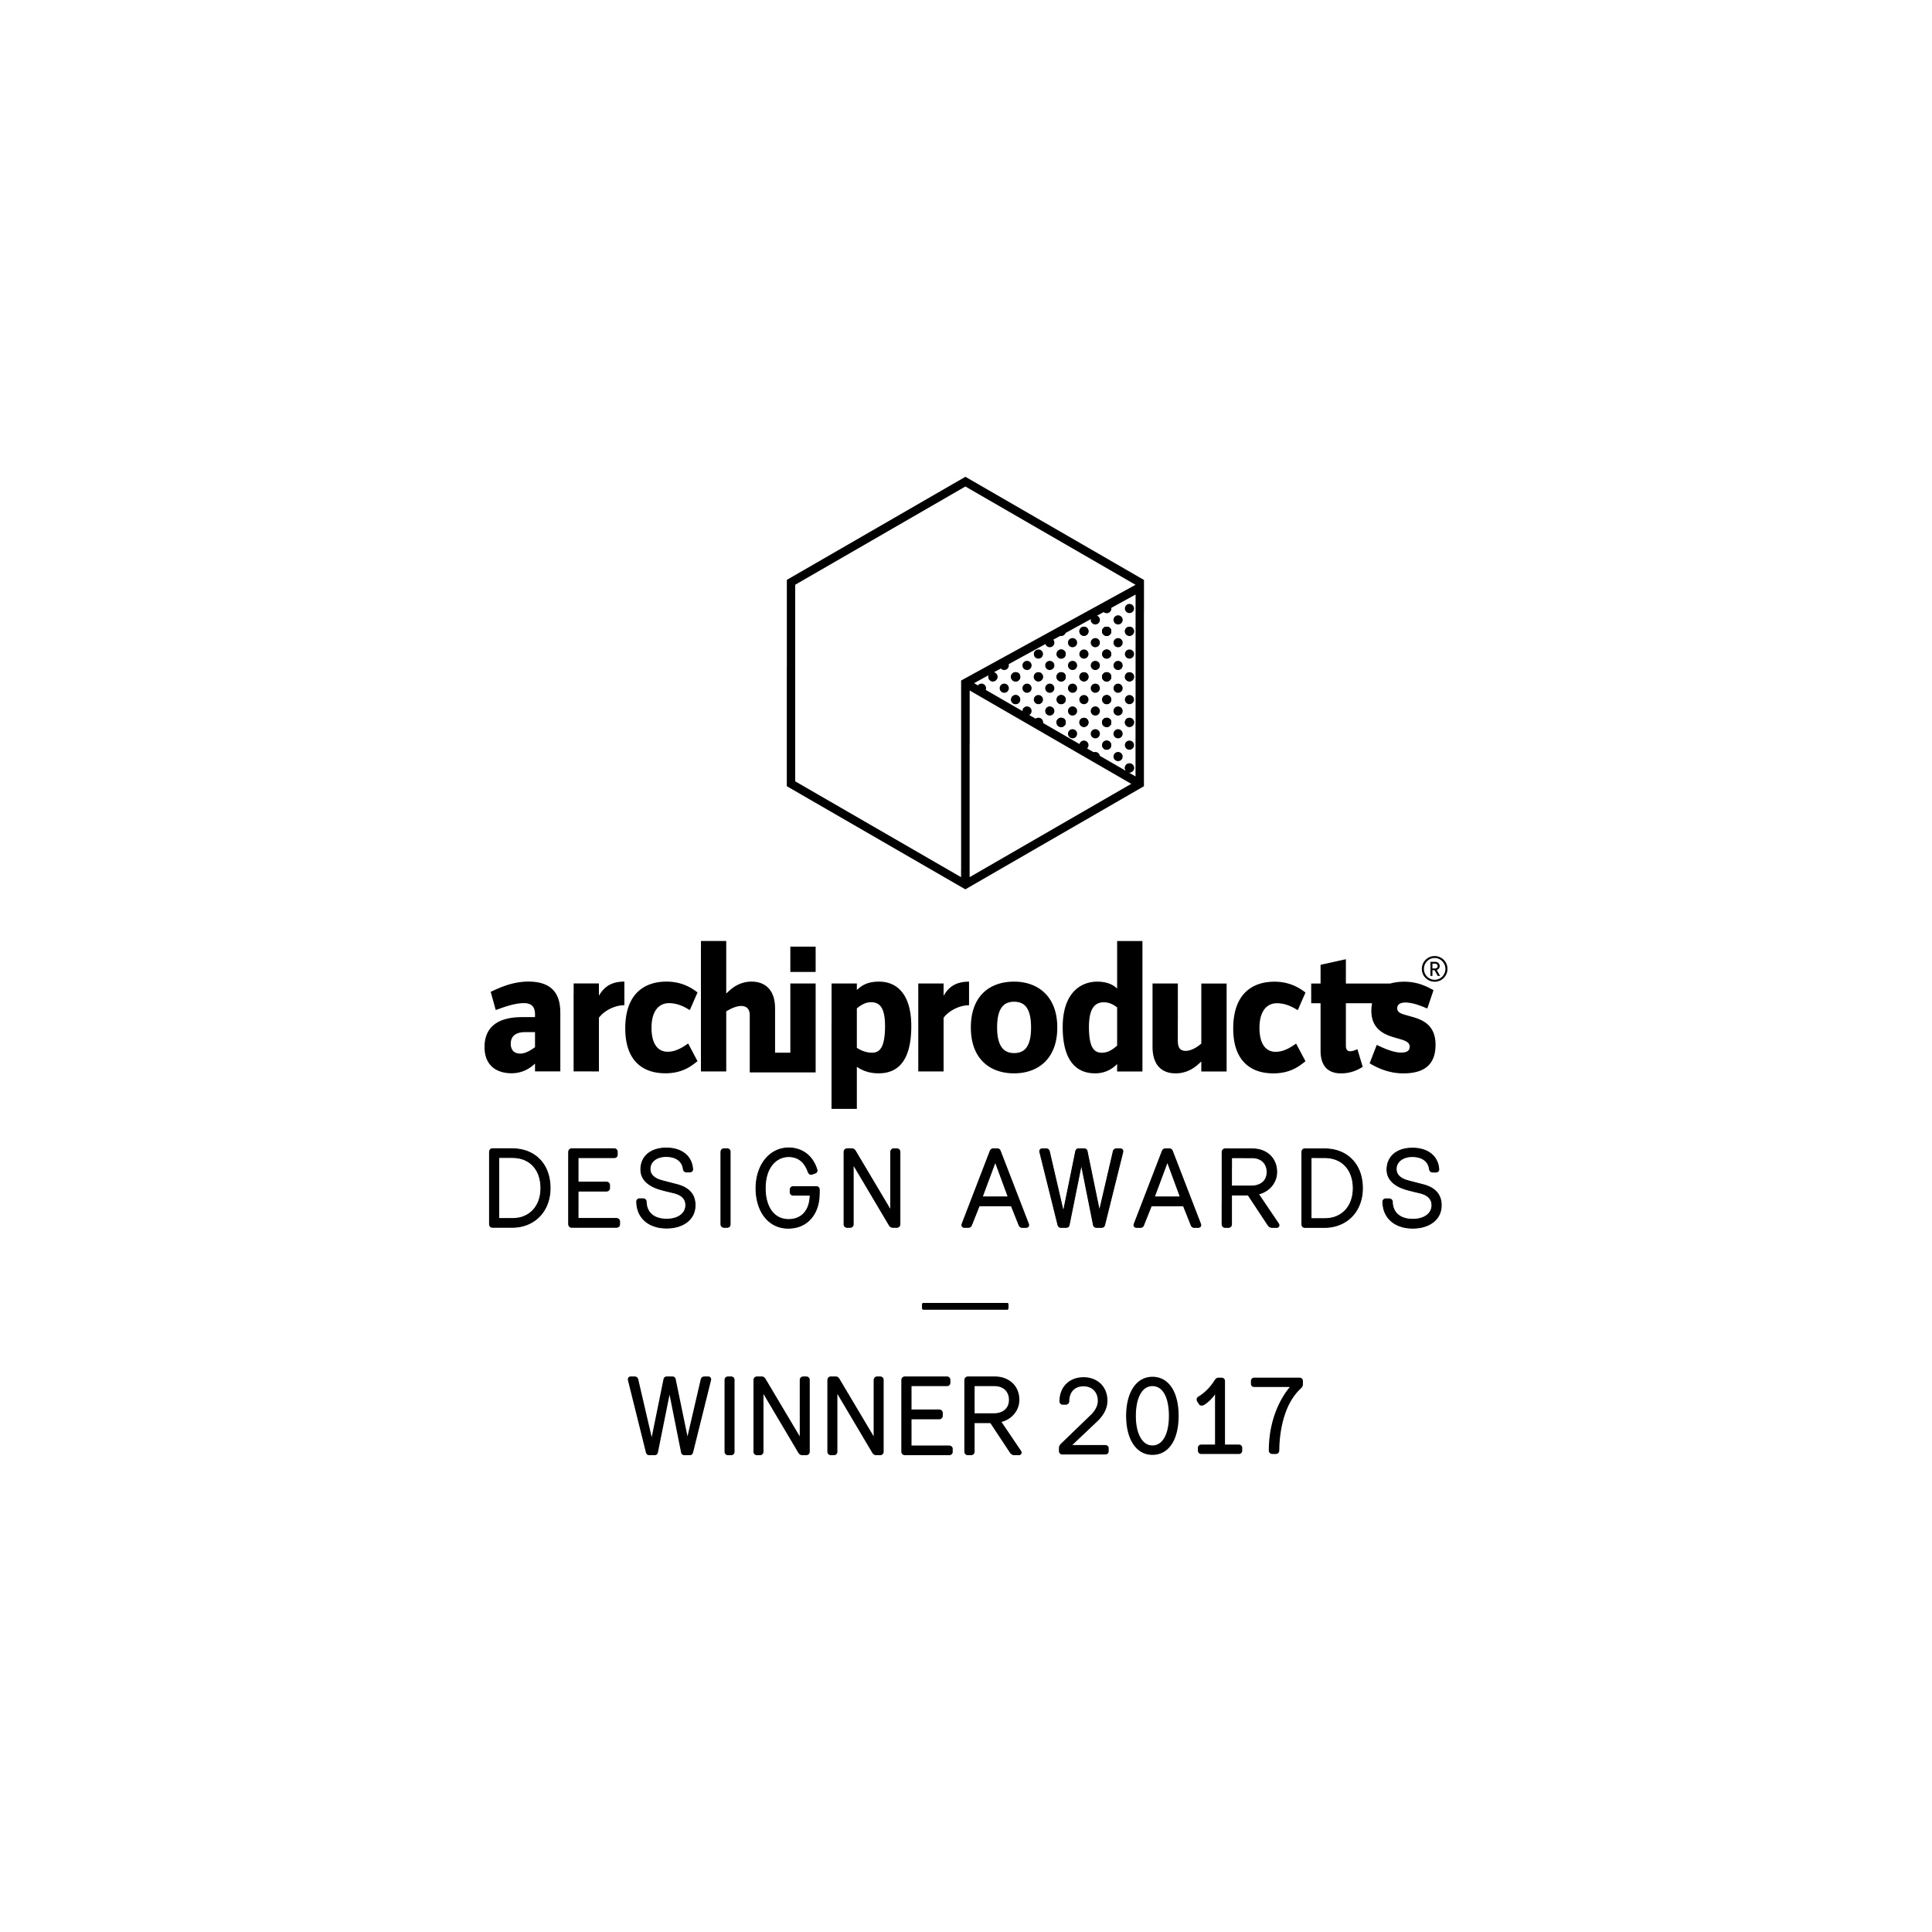 Archiproducts Design Awards 2017 - Kebne Outdoor Gym by Kauppi & Kauppi